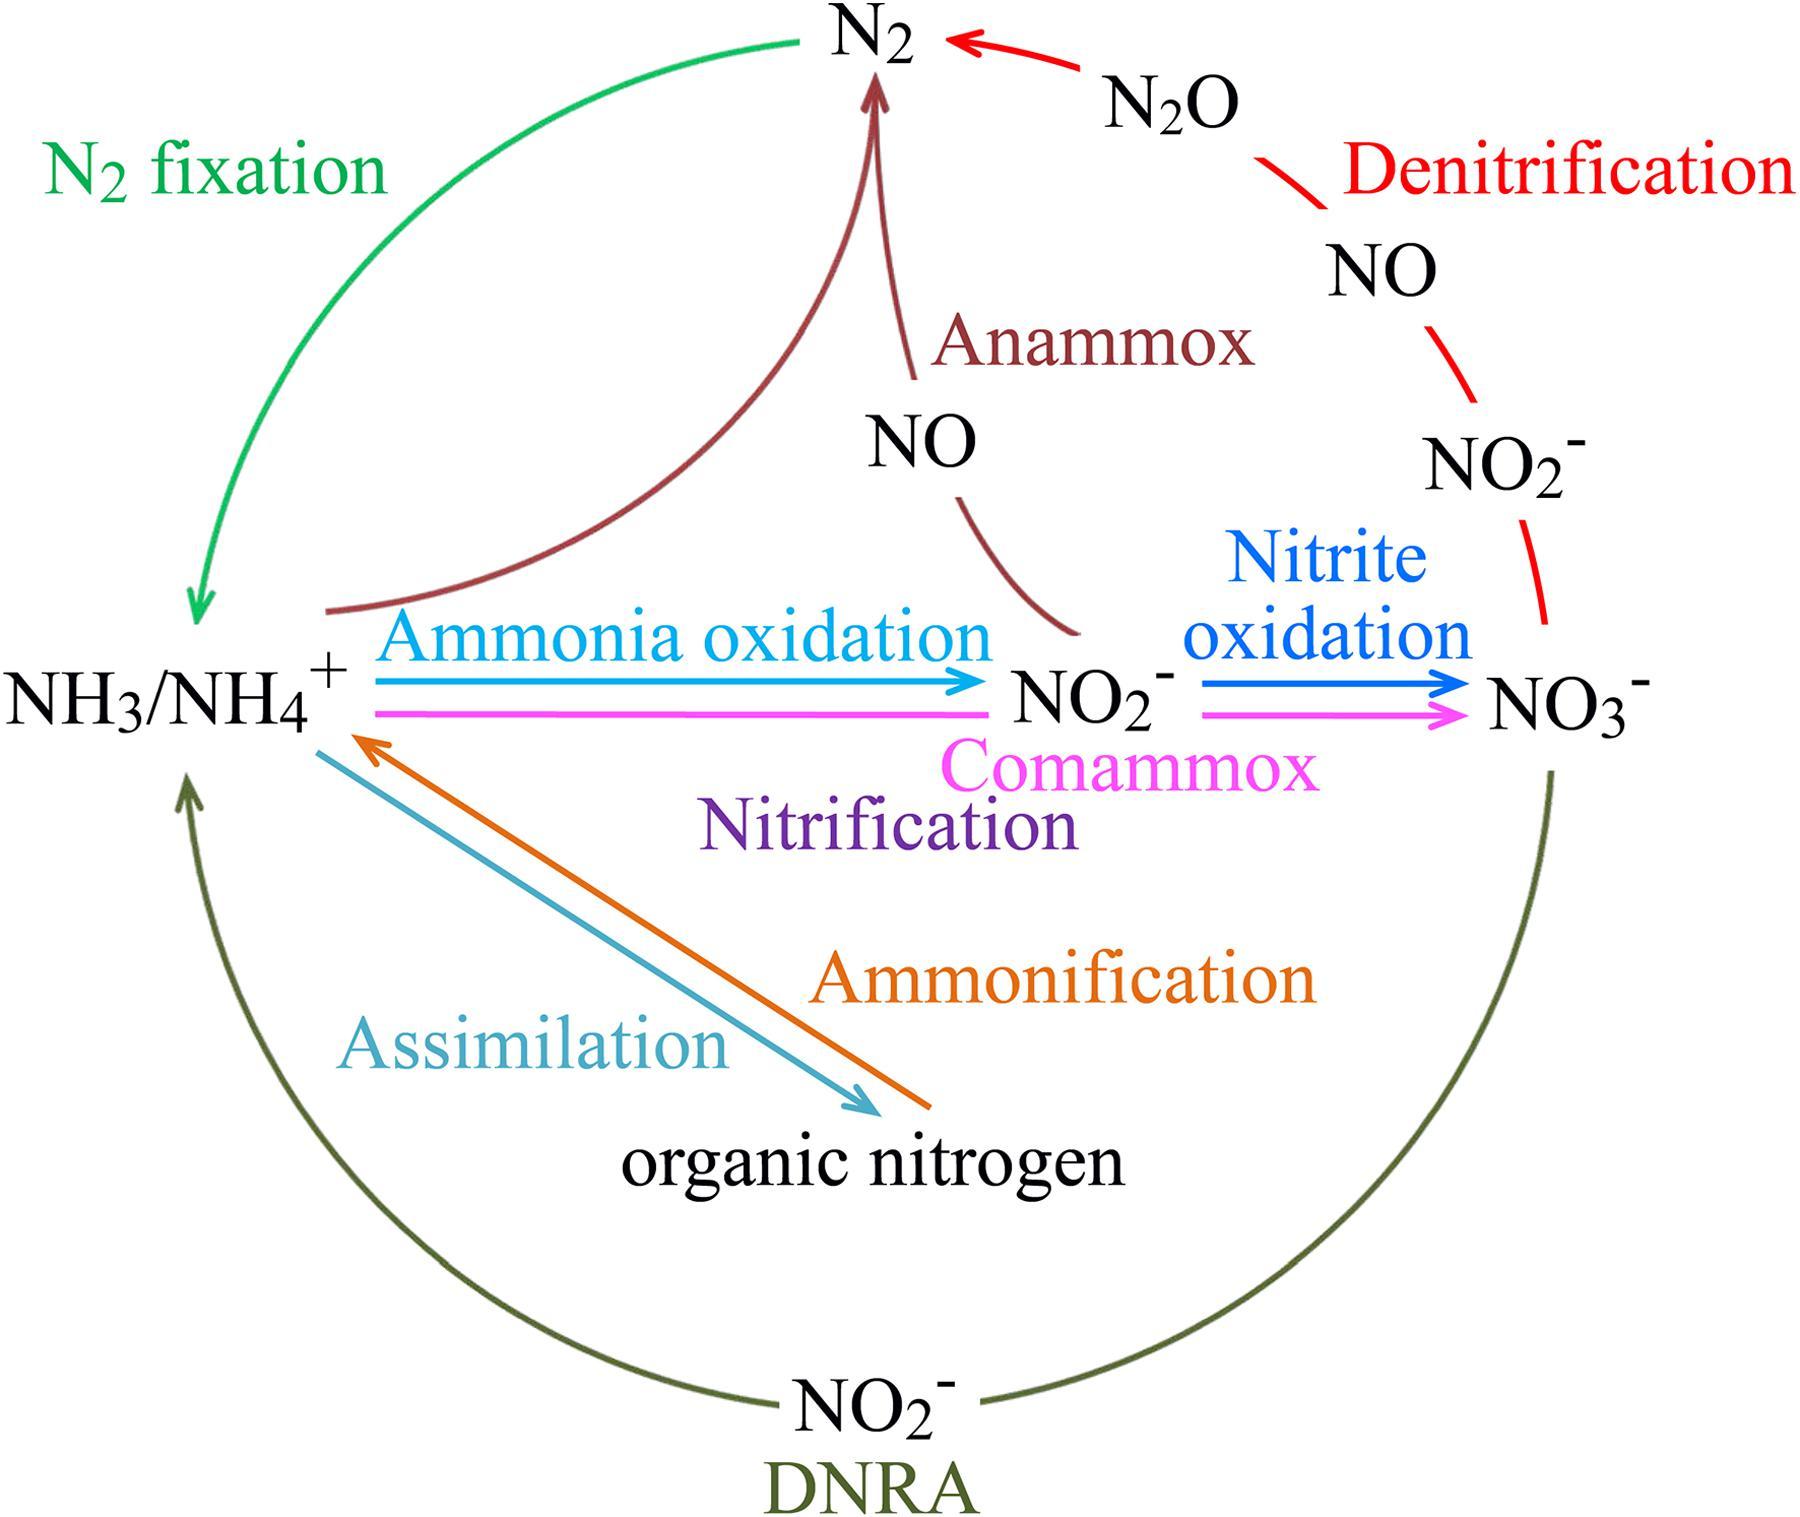 nitrogen fixation nitrification denitrification relationship goals